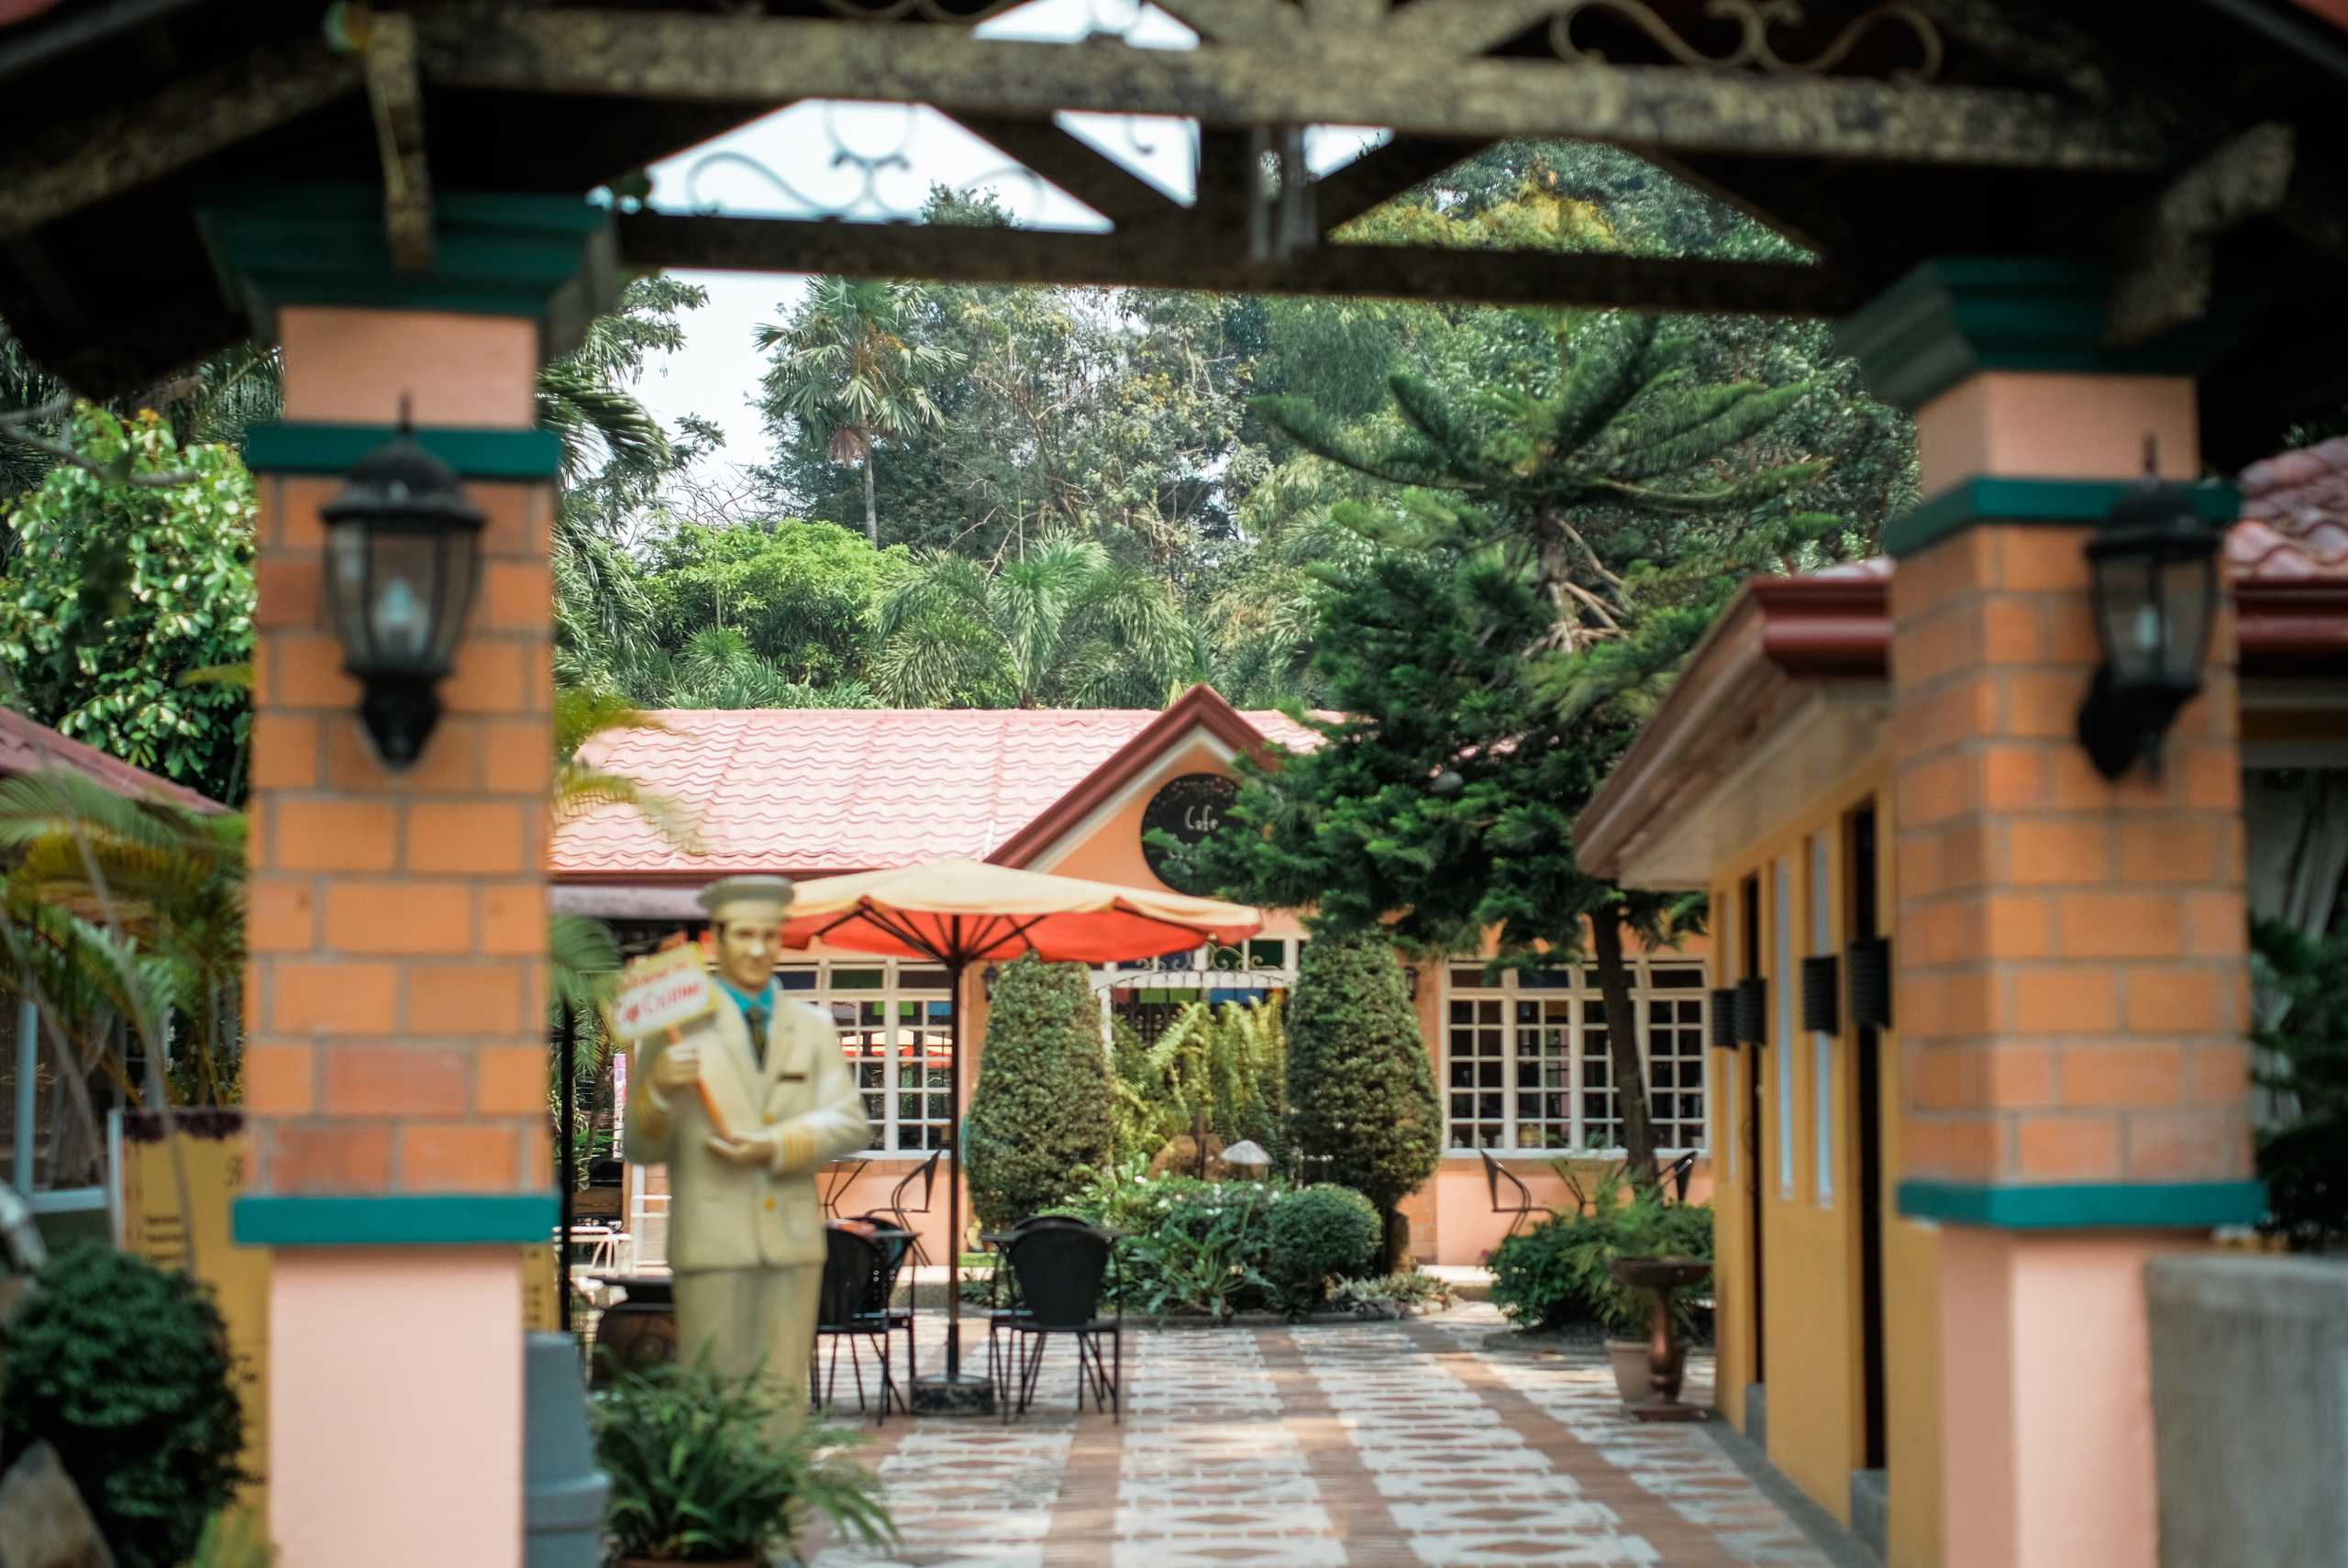 Cafe Cristina